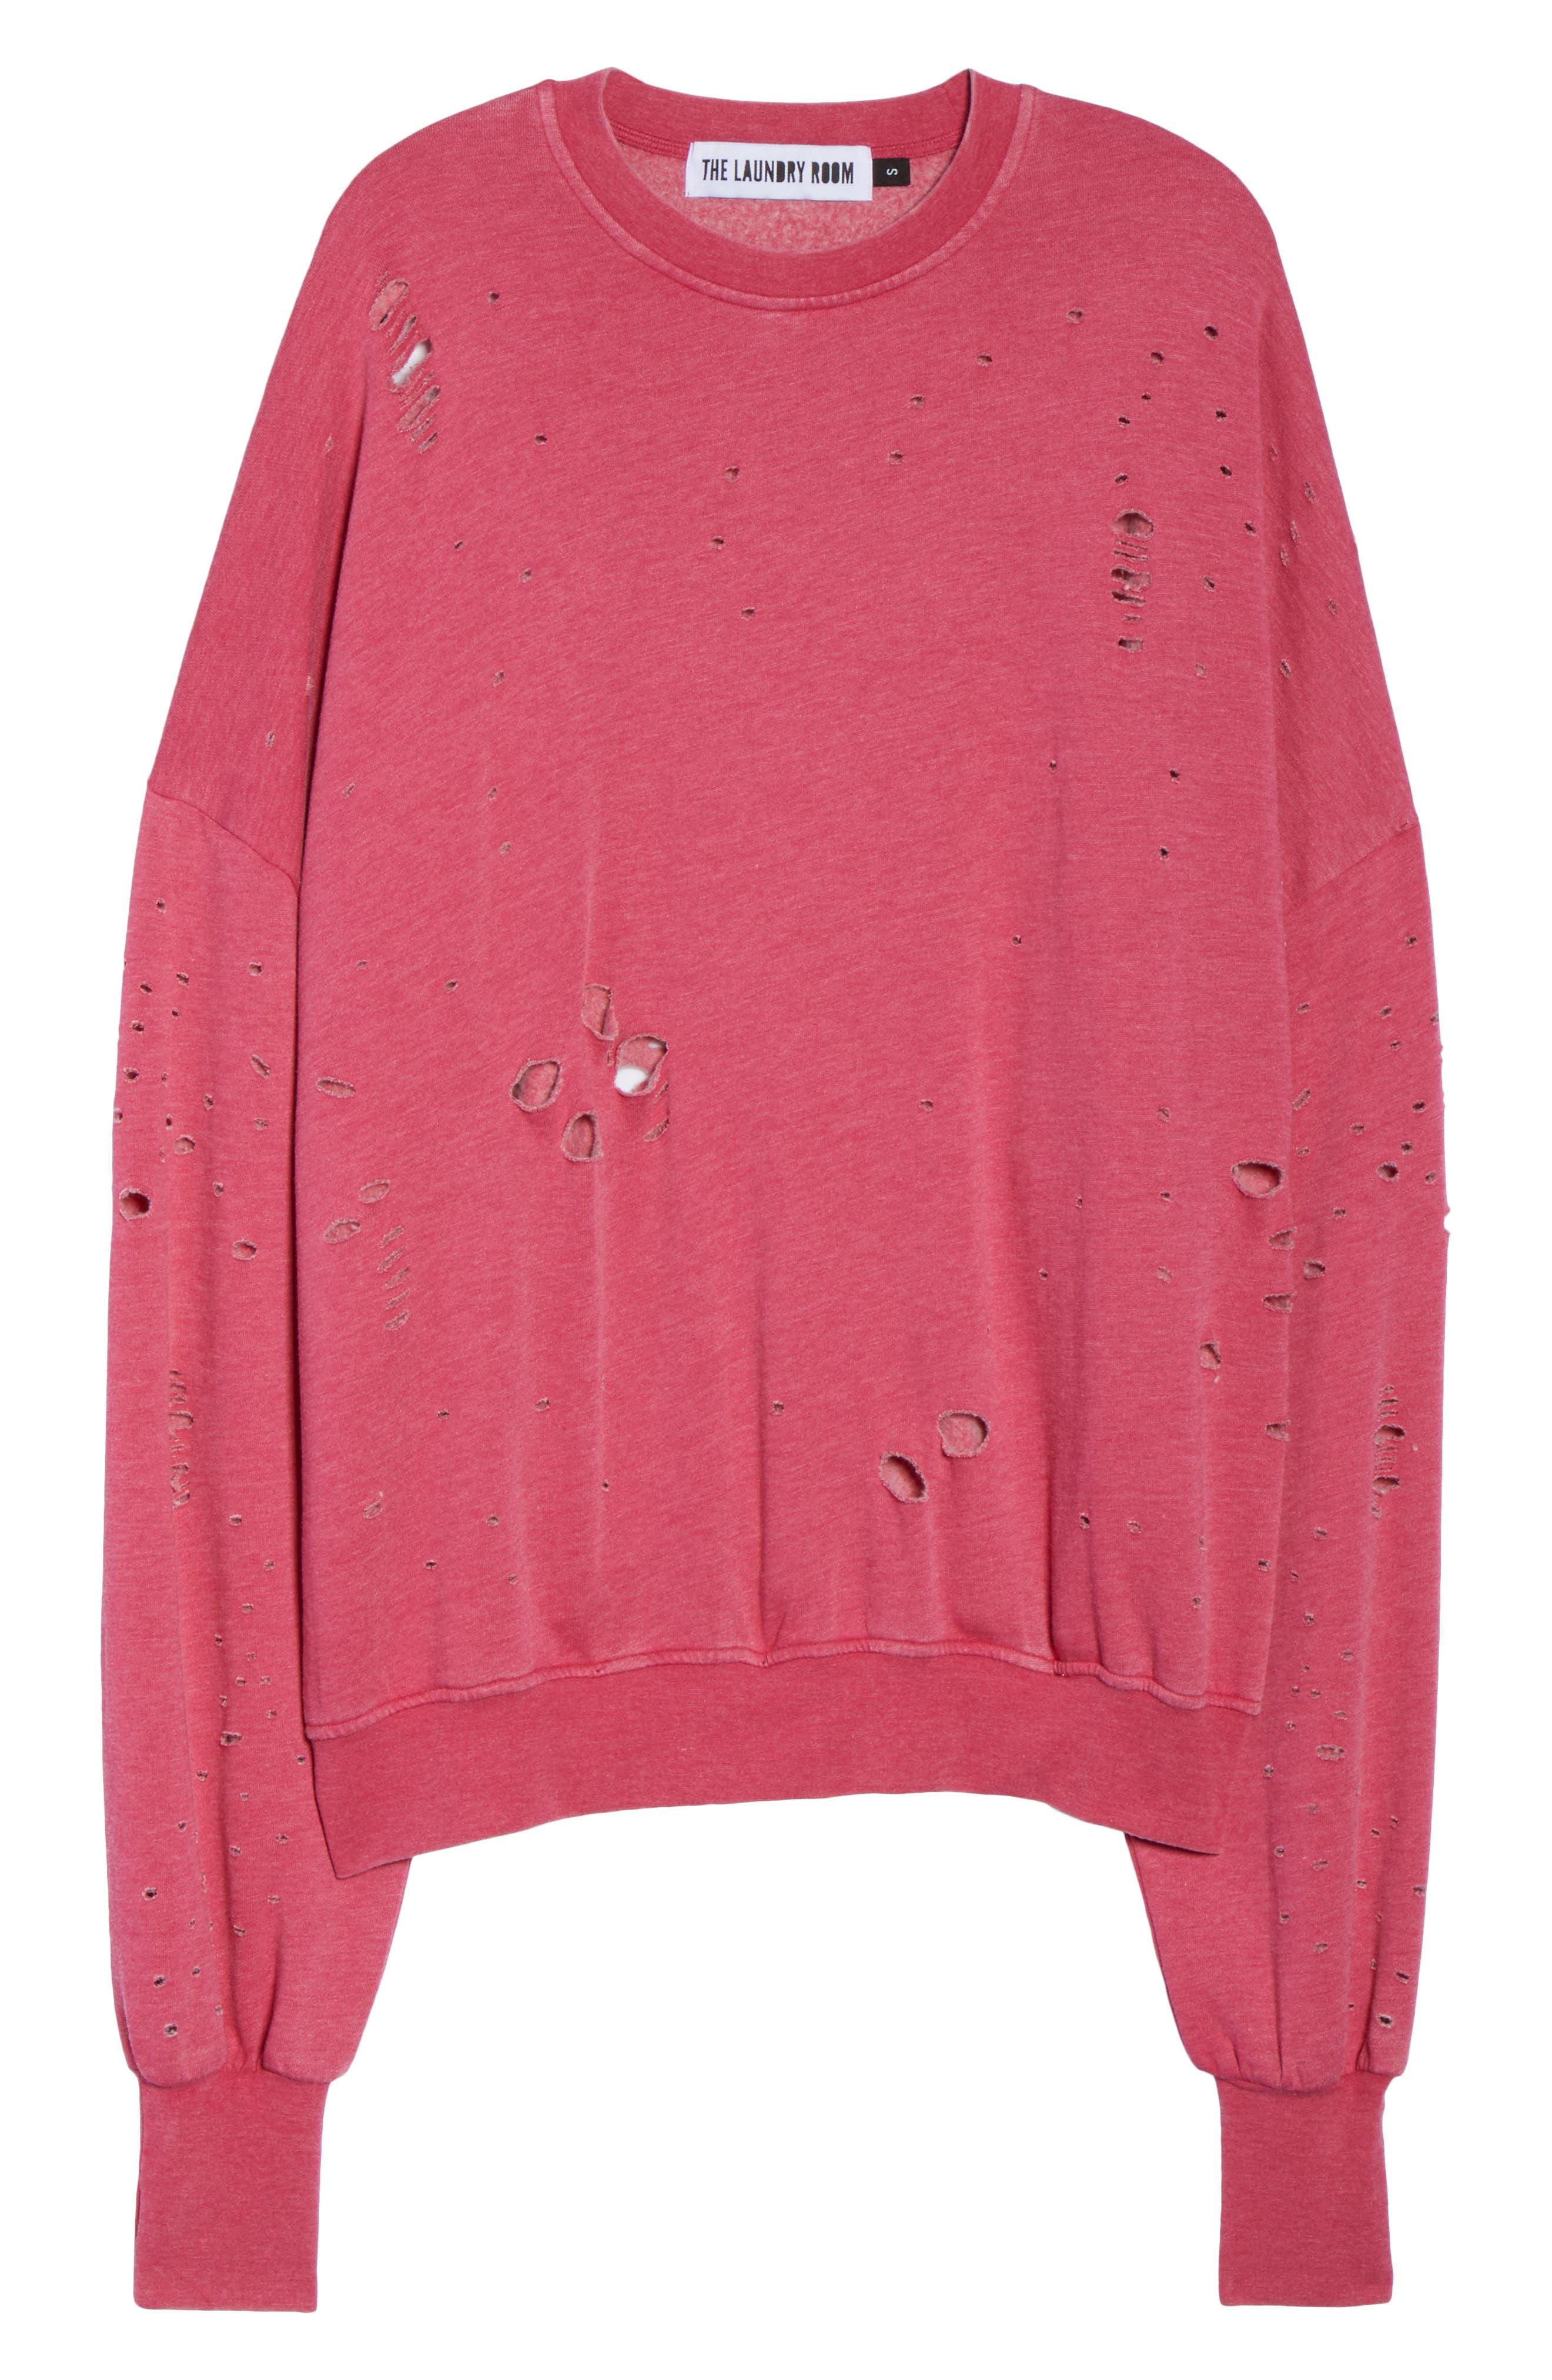 Thrasher Sweatshirt,                             Alternate thumbnail 6, color,                             Flamingo